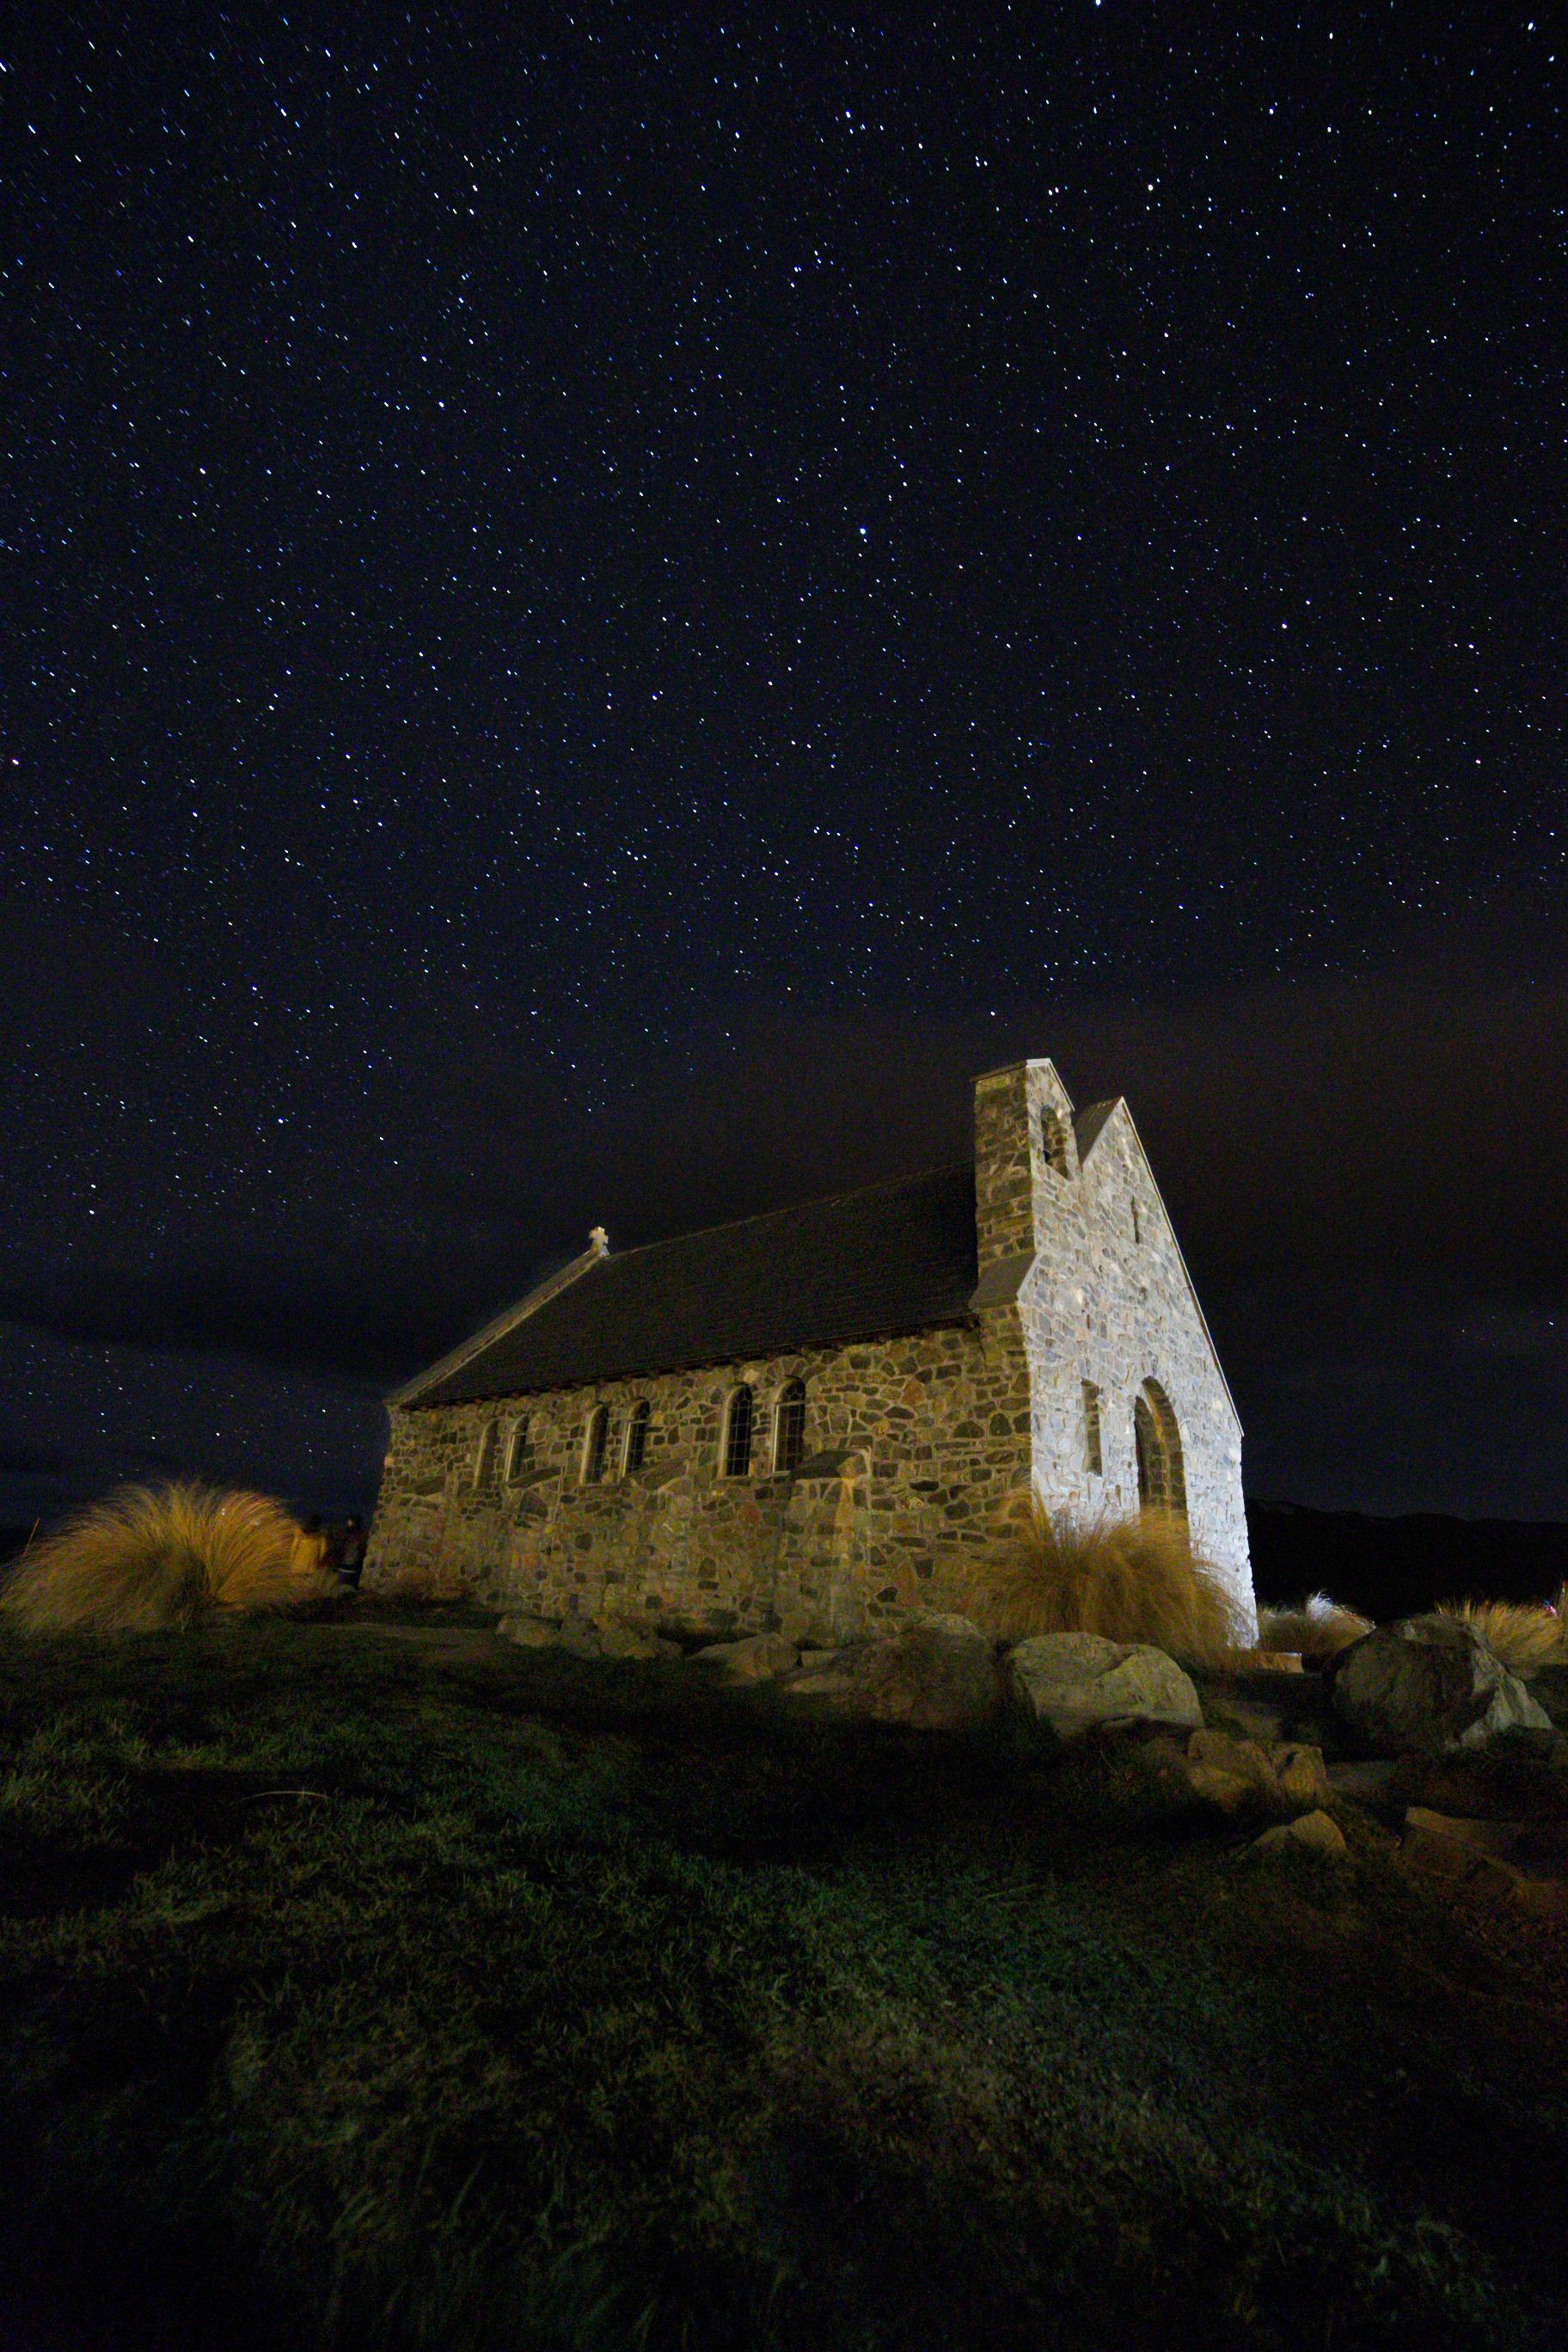 The Church of the Good Shepherd at night under stars, Tekapo.